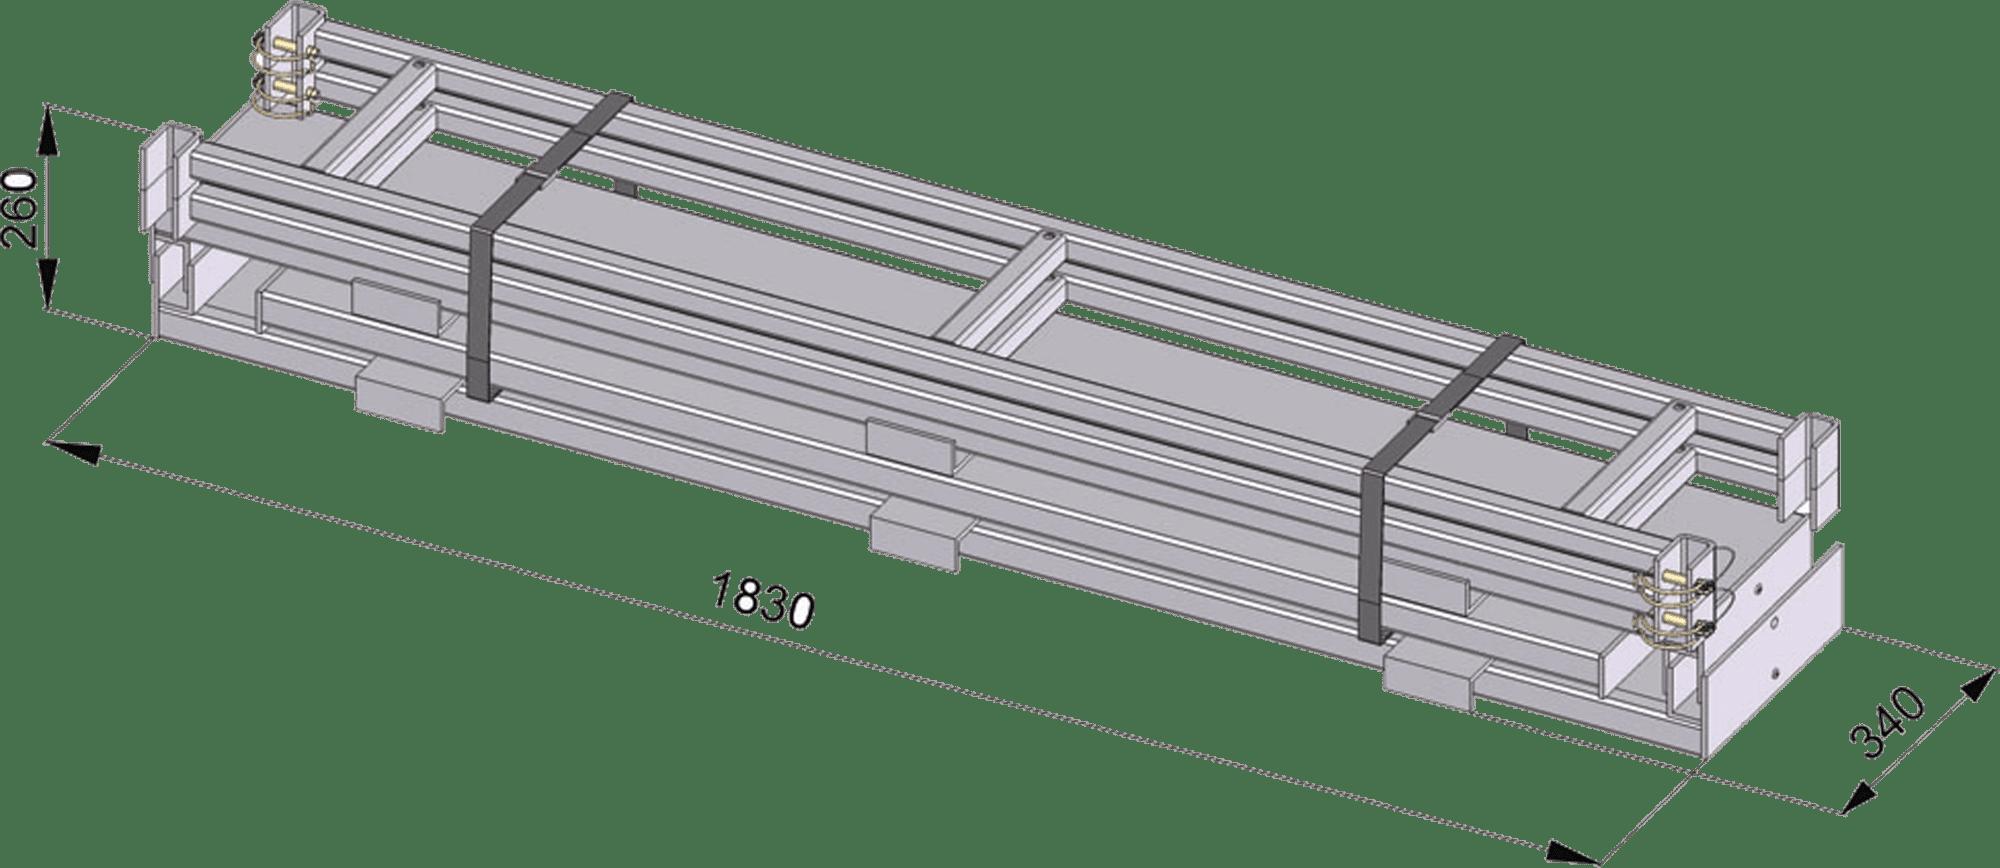 záchranná hasičská plošina trucksawer